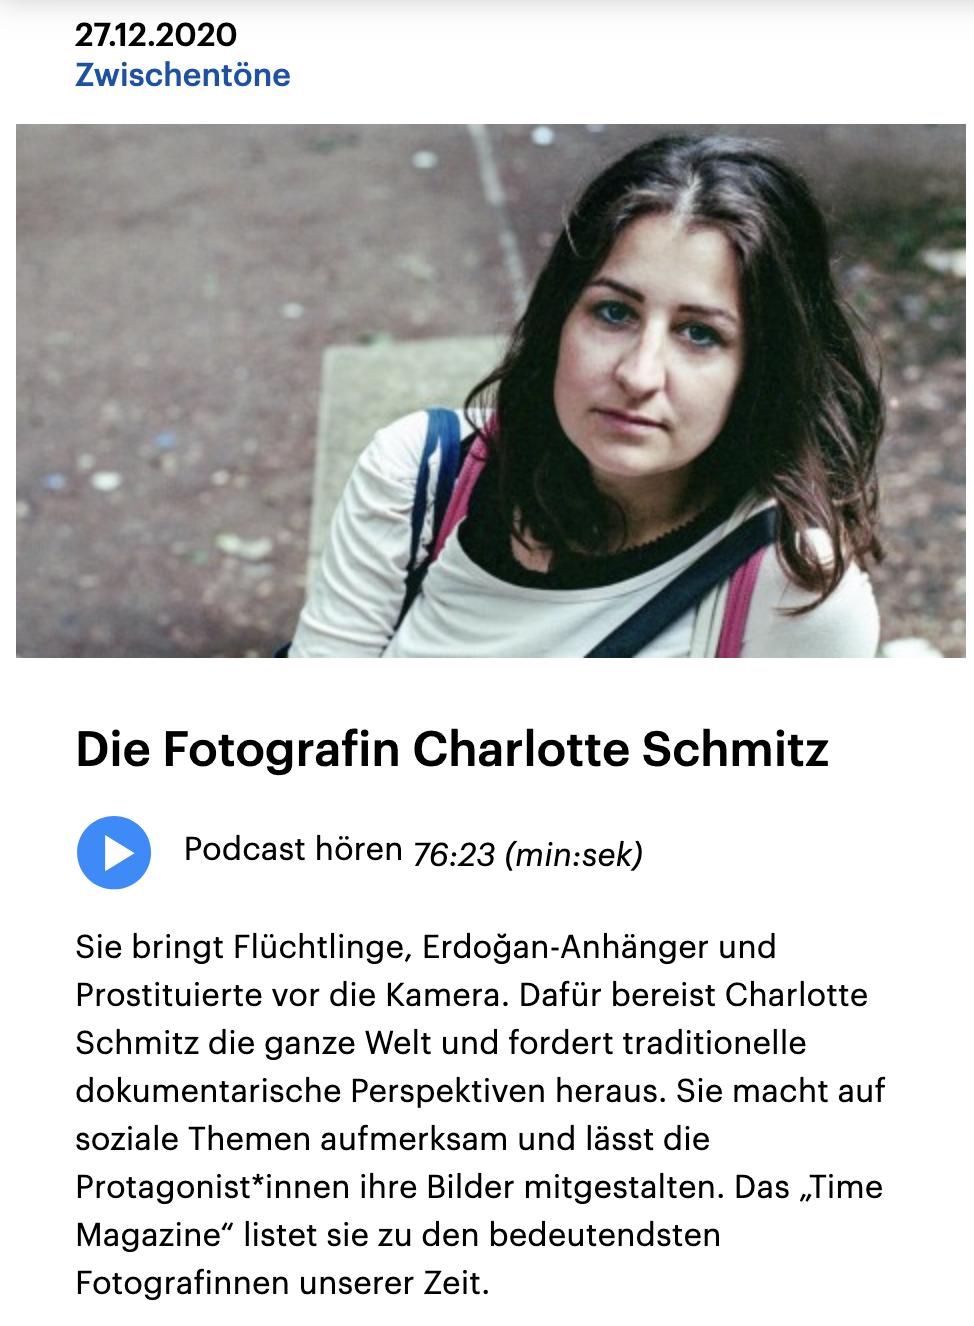 Art and Documentary Photography - Loading Bildschirmfoto_2021-04-06_um_10.59.03.png